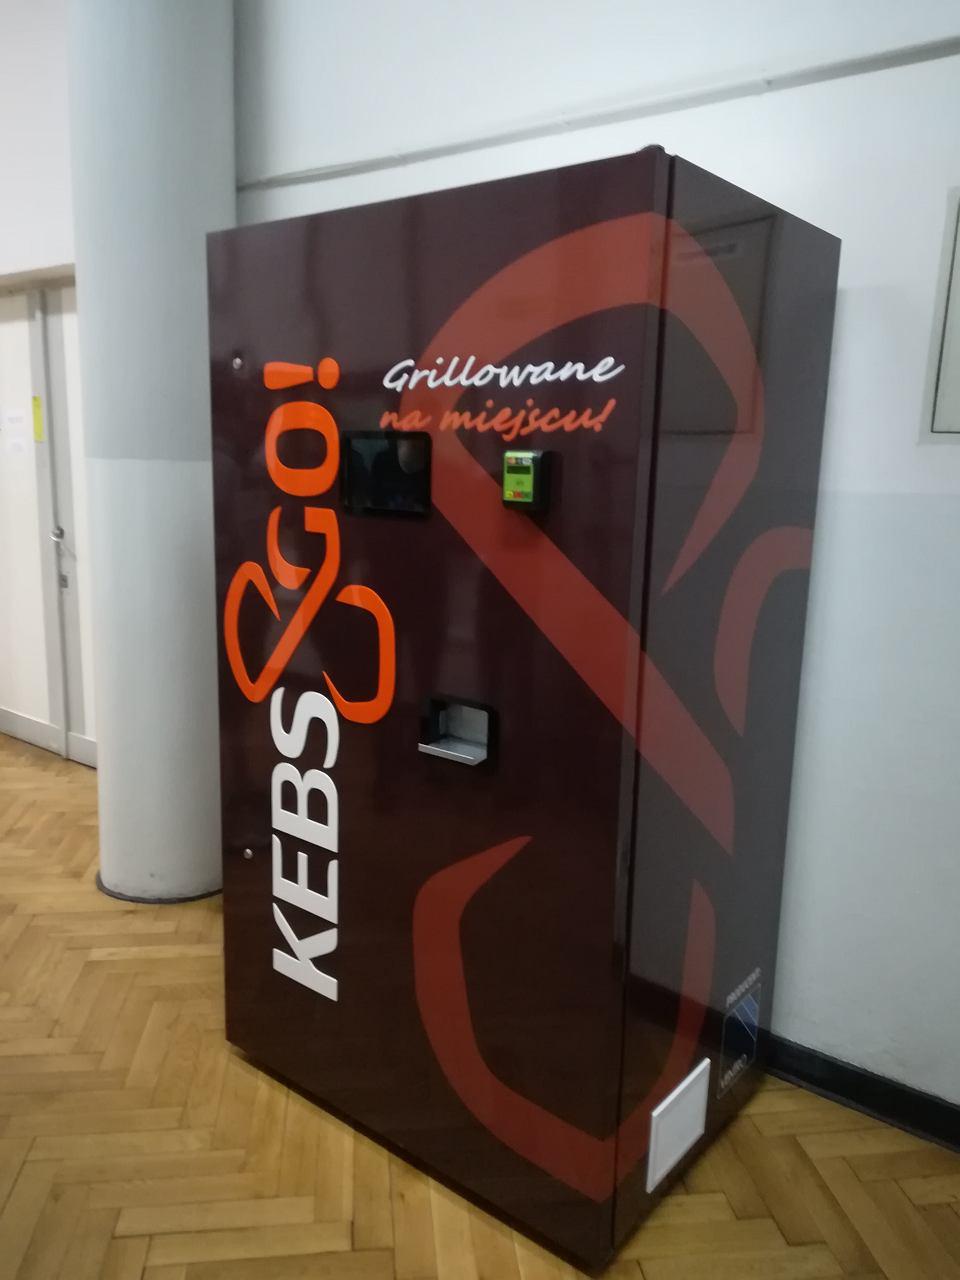 Automat z kebabem